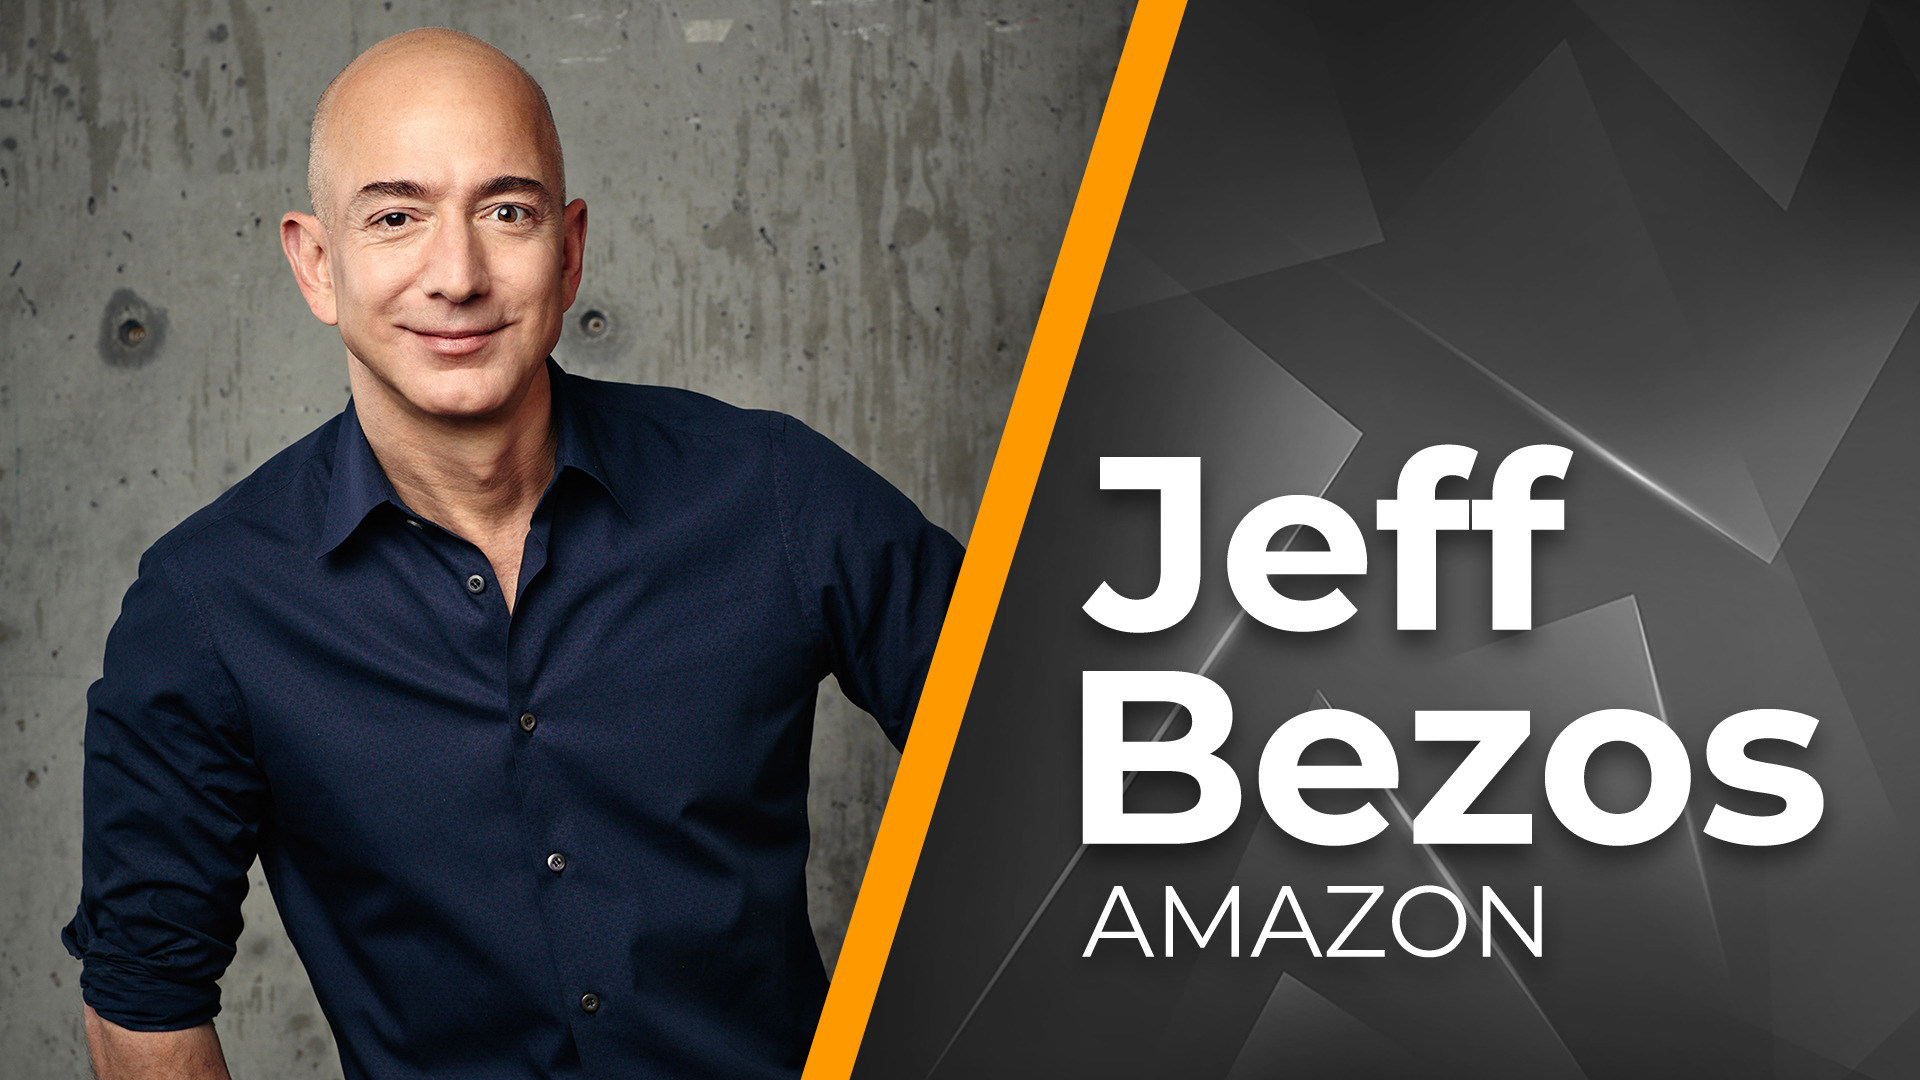 Amazon, Jeff Bezos, Bezos, Amazon CEO